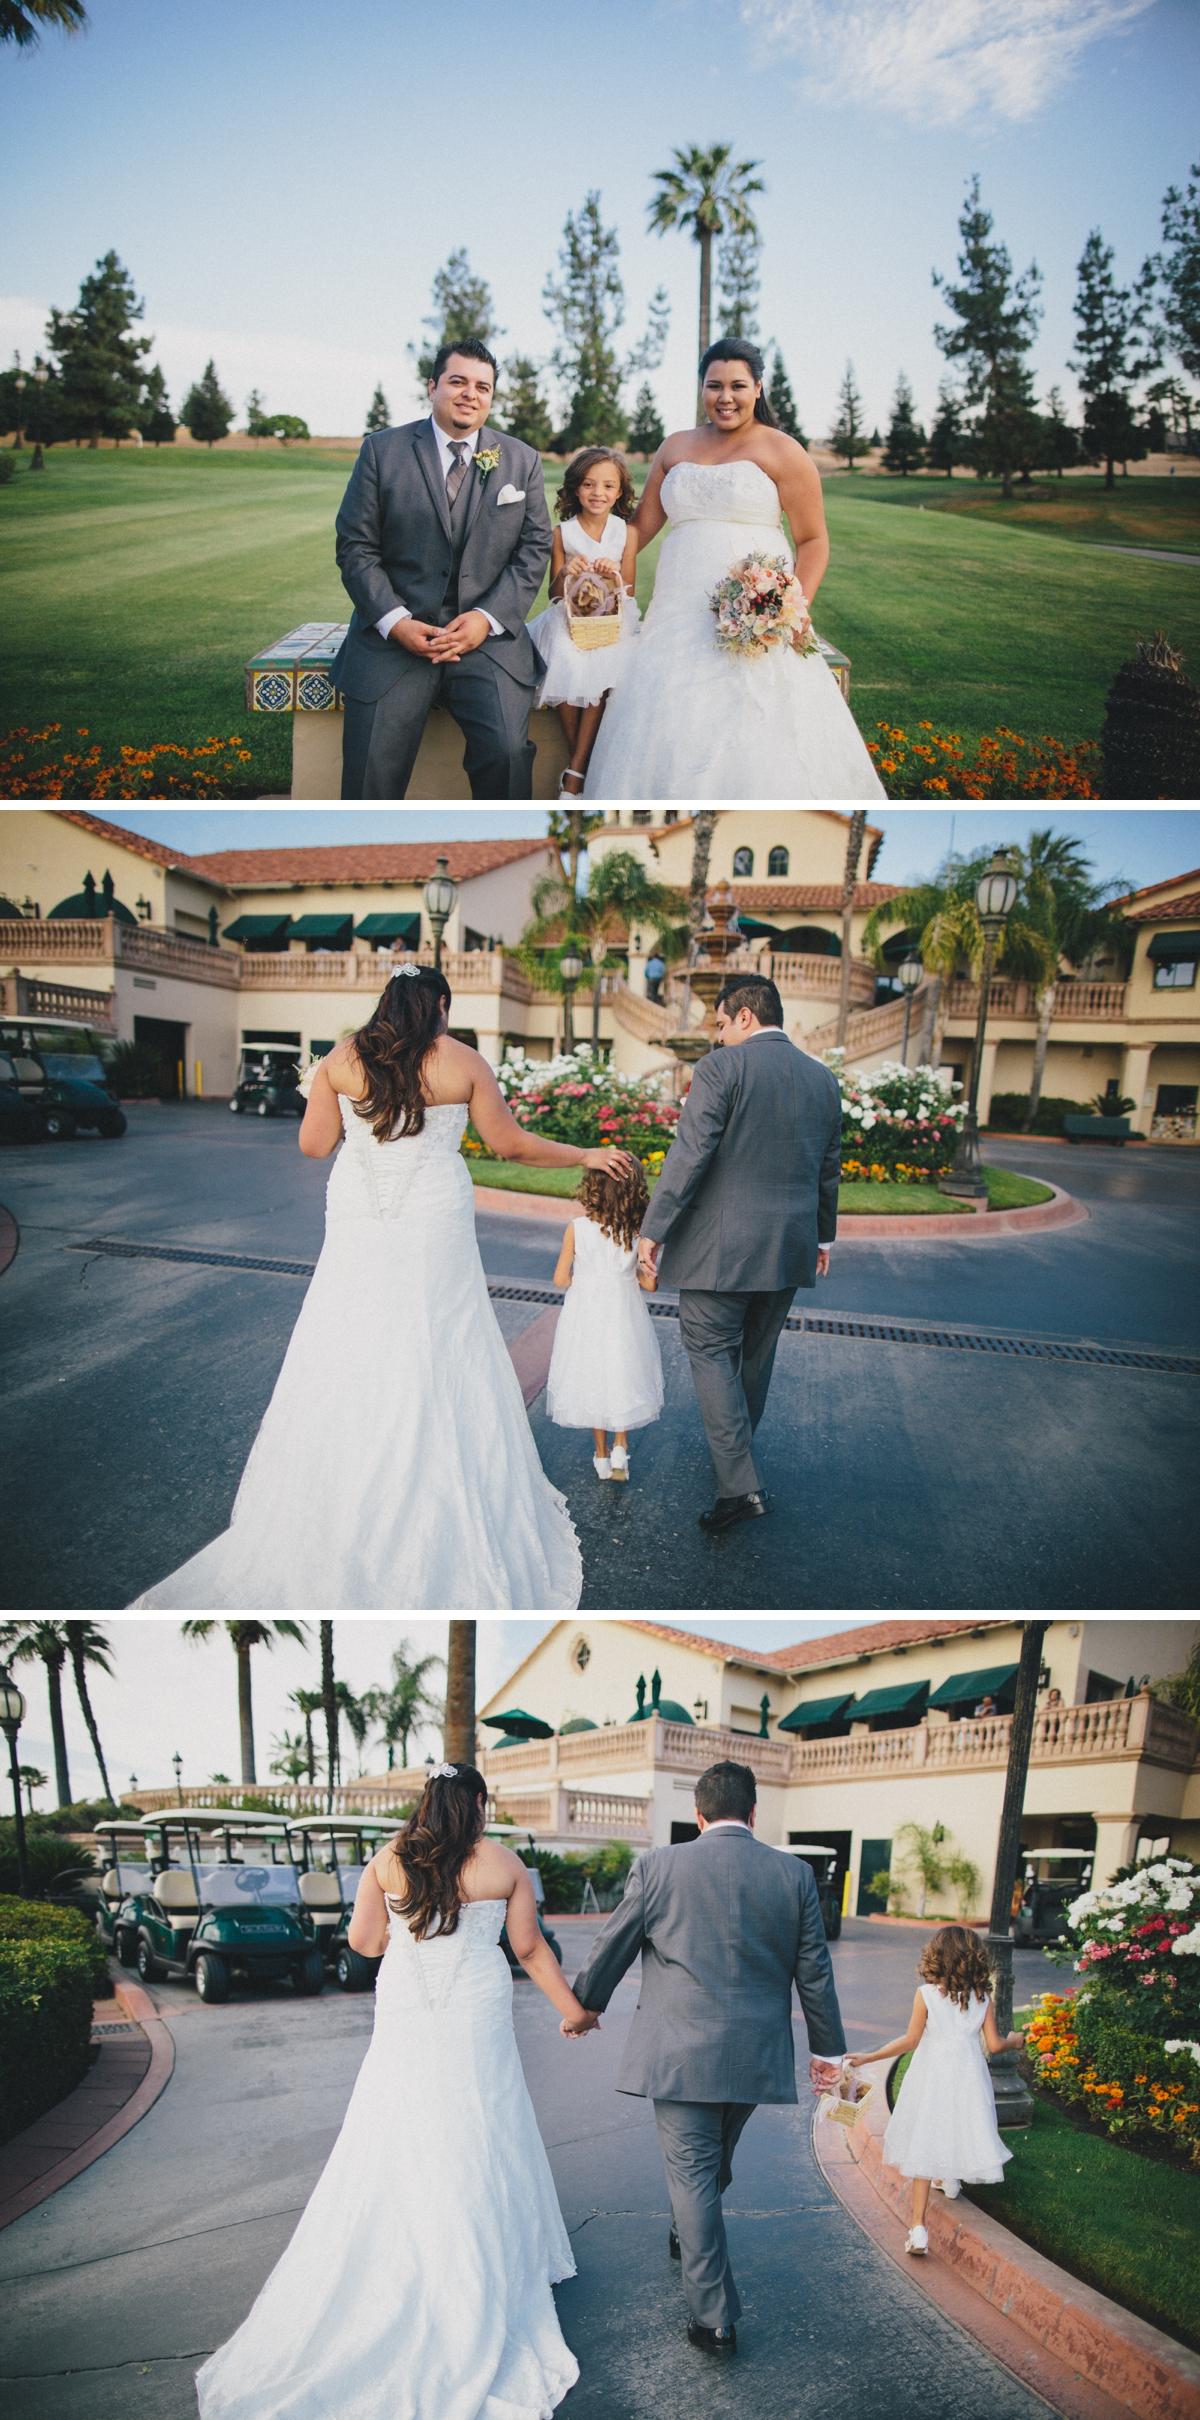 California Wedding Photographer - Patty Lagera